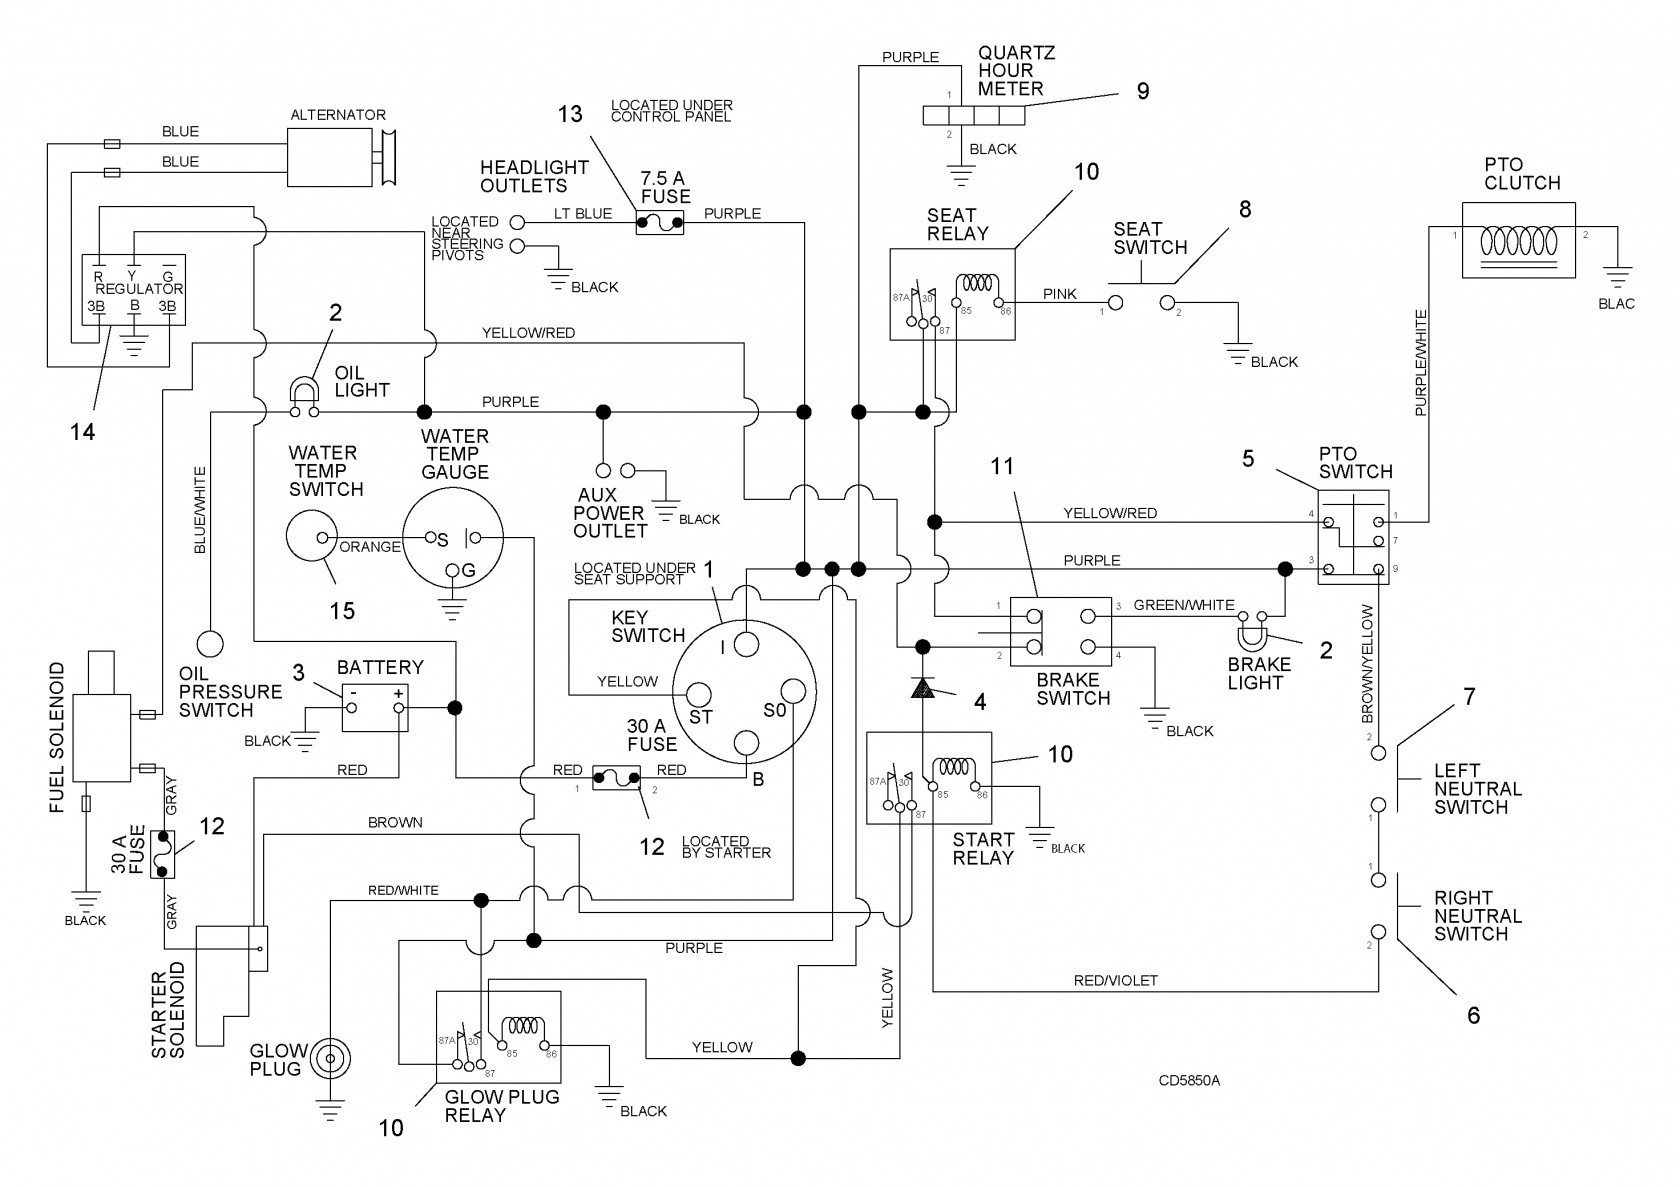 denso 101211 1420 suzuki wiring diagram - wiring diagrams site way-mode -  way-mode.rimedifitoterapici.it  rimedifitoterapici.it